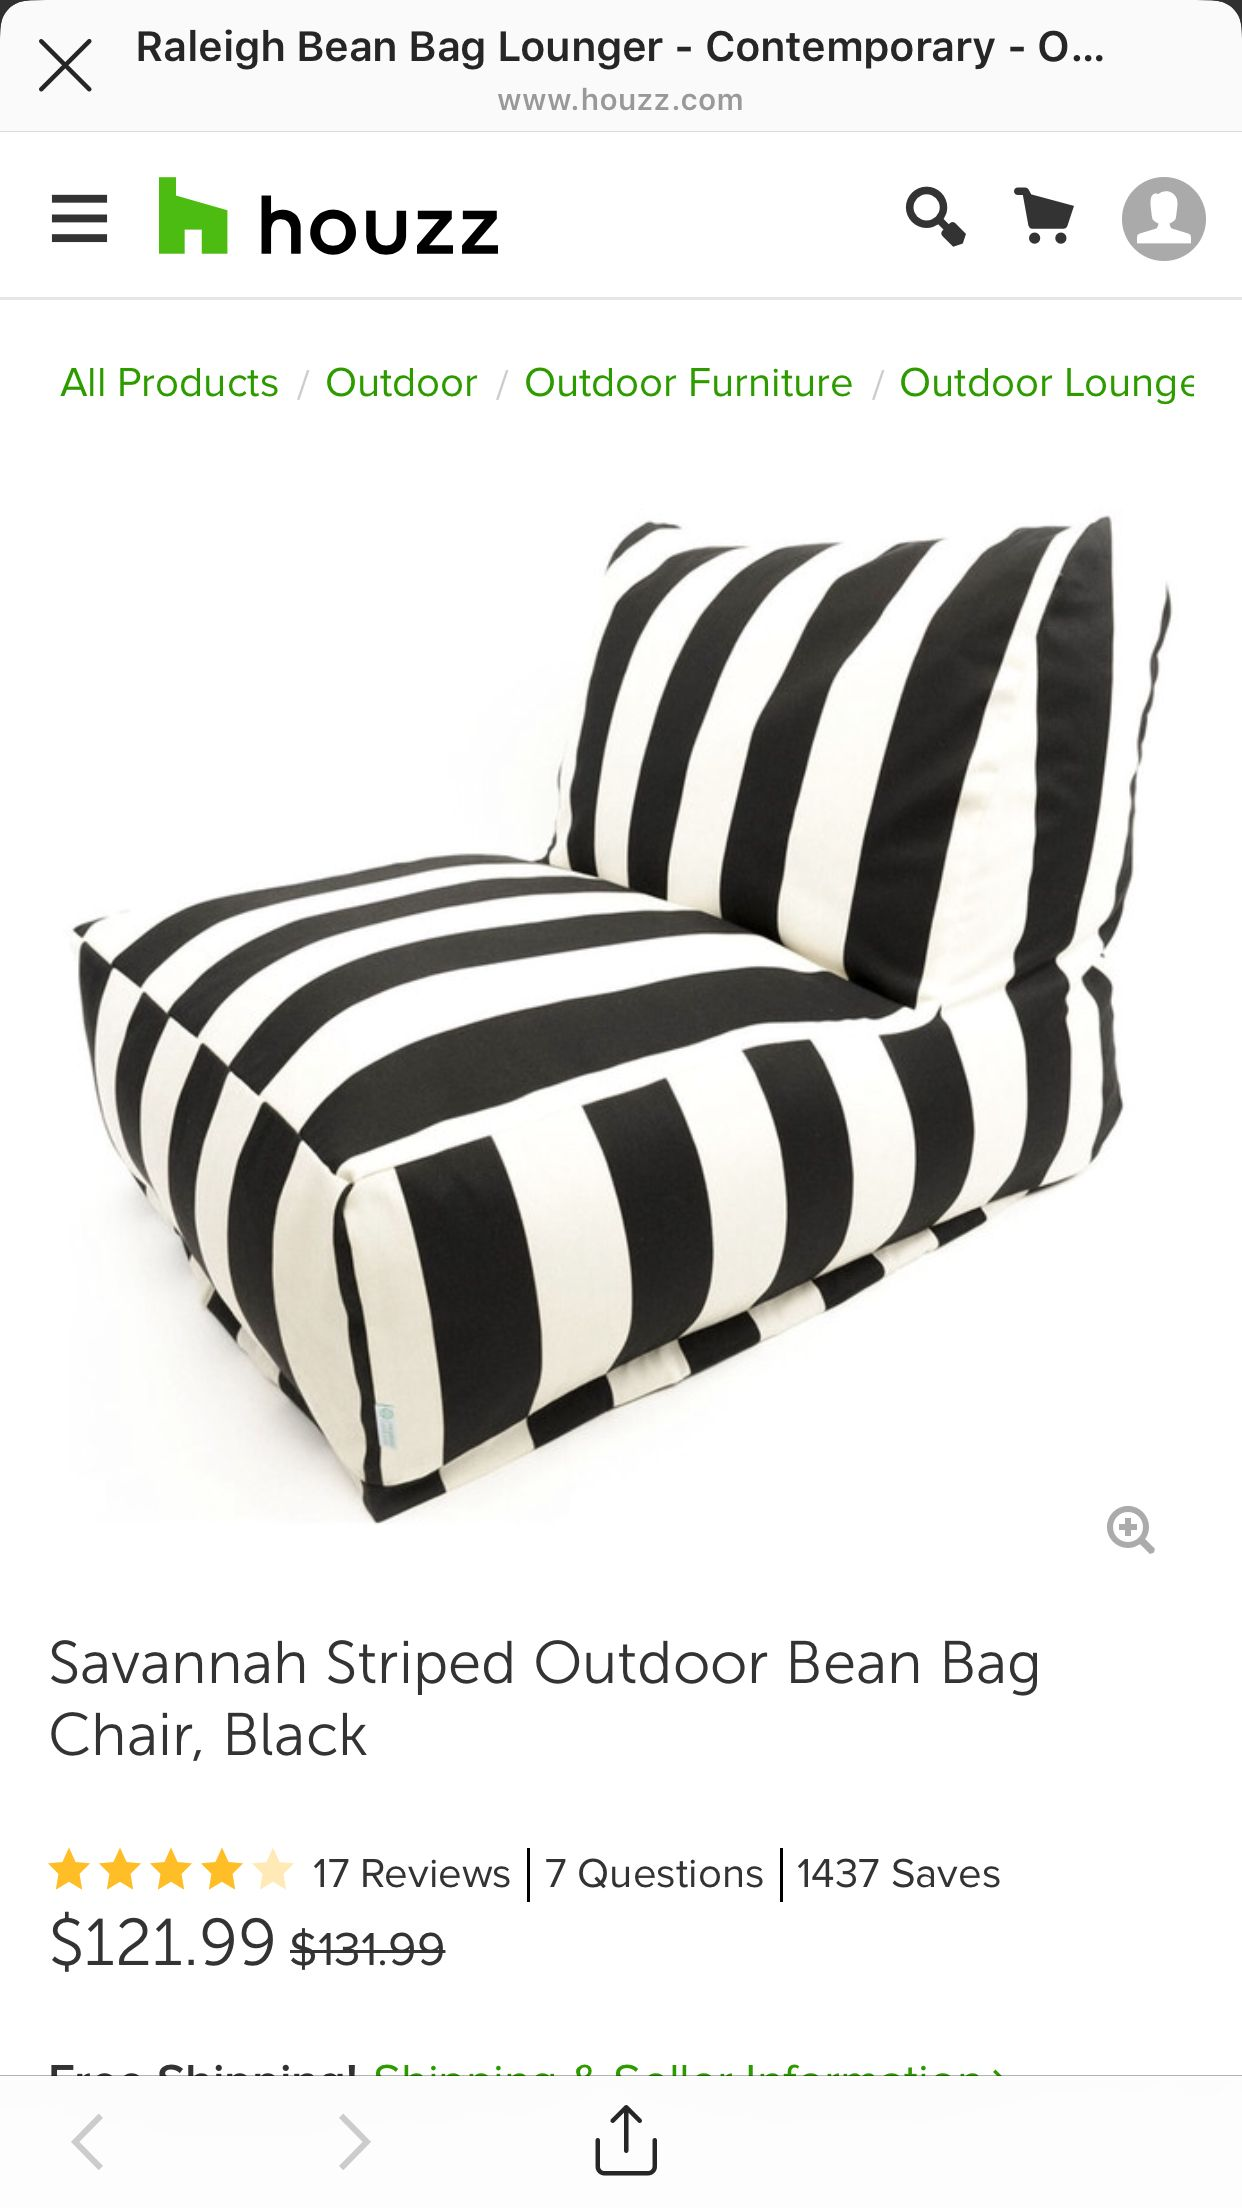 Pin by JB Brown on Decor Outdoor bean bag chair, Bean